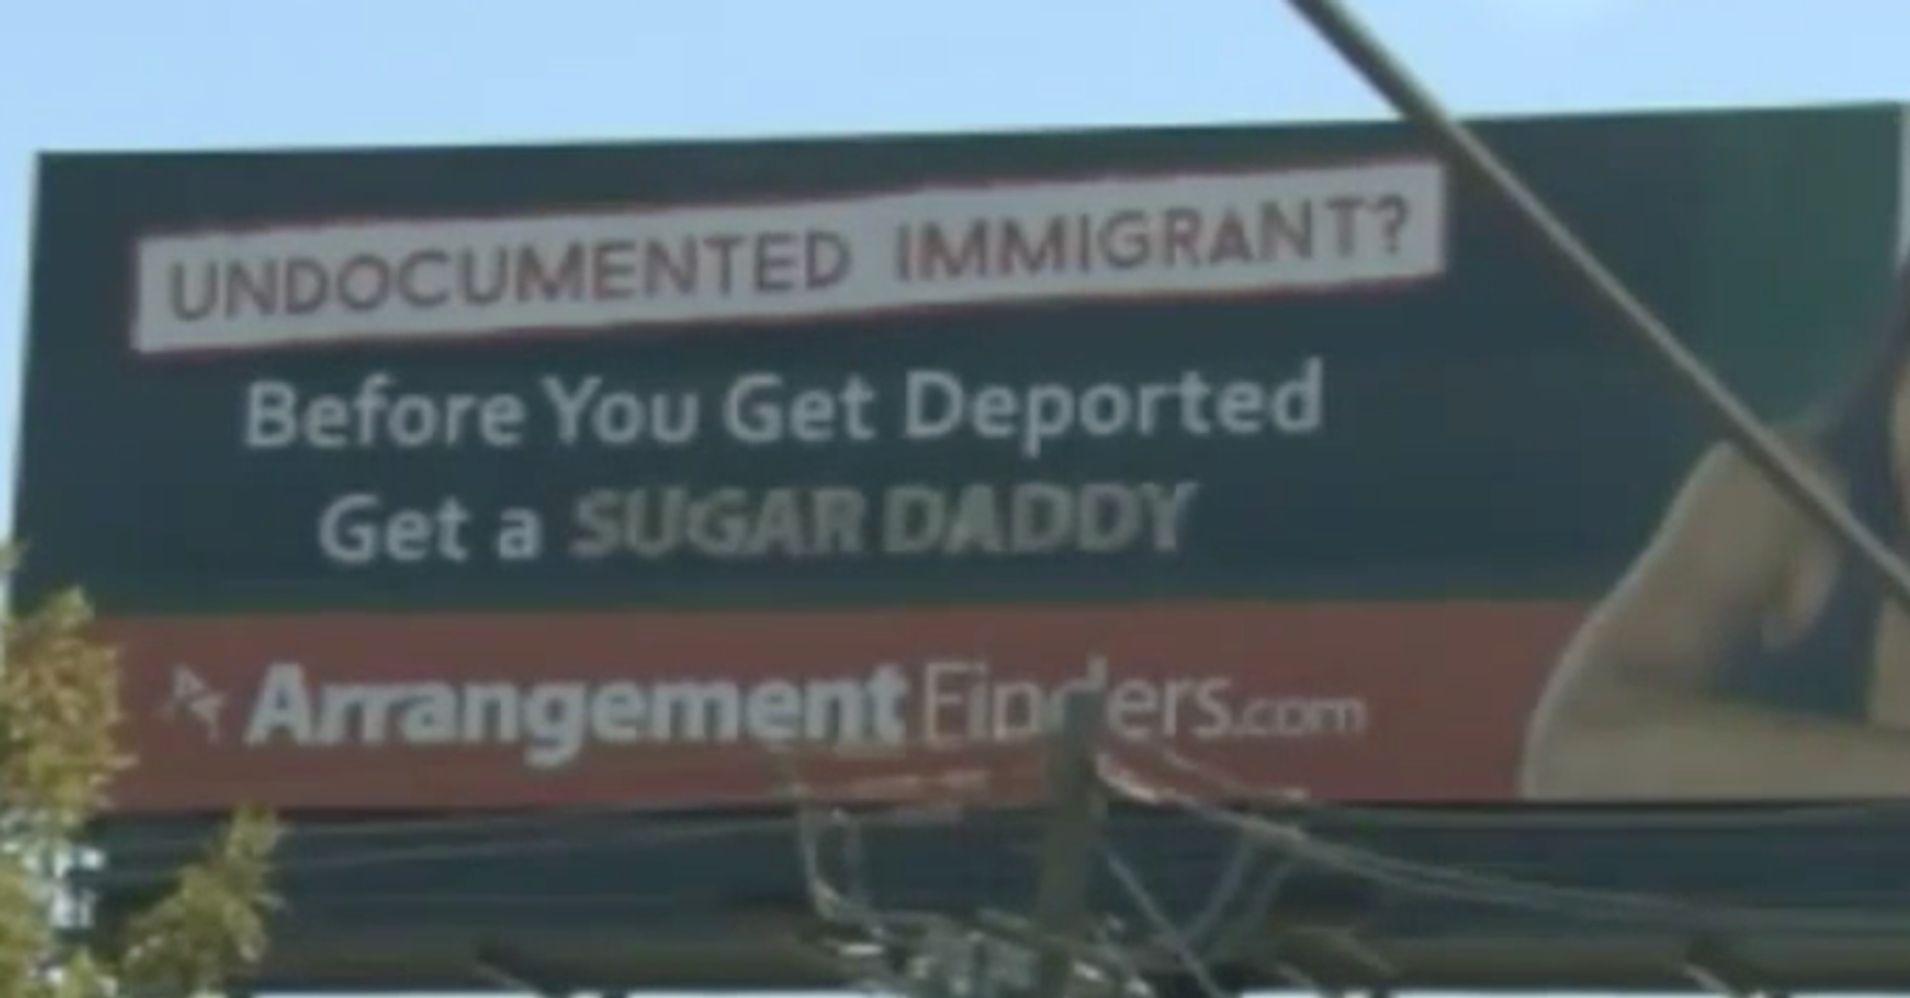 Sugar Daddy Website Removes Tasteless Billboard Targeting Immigrant